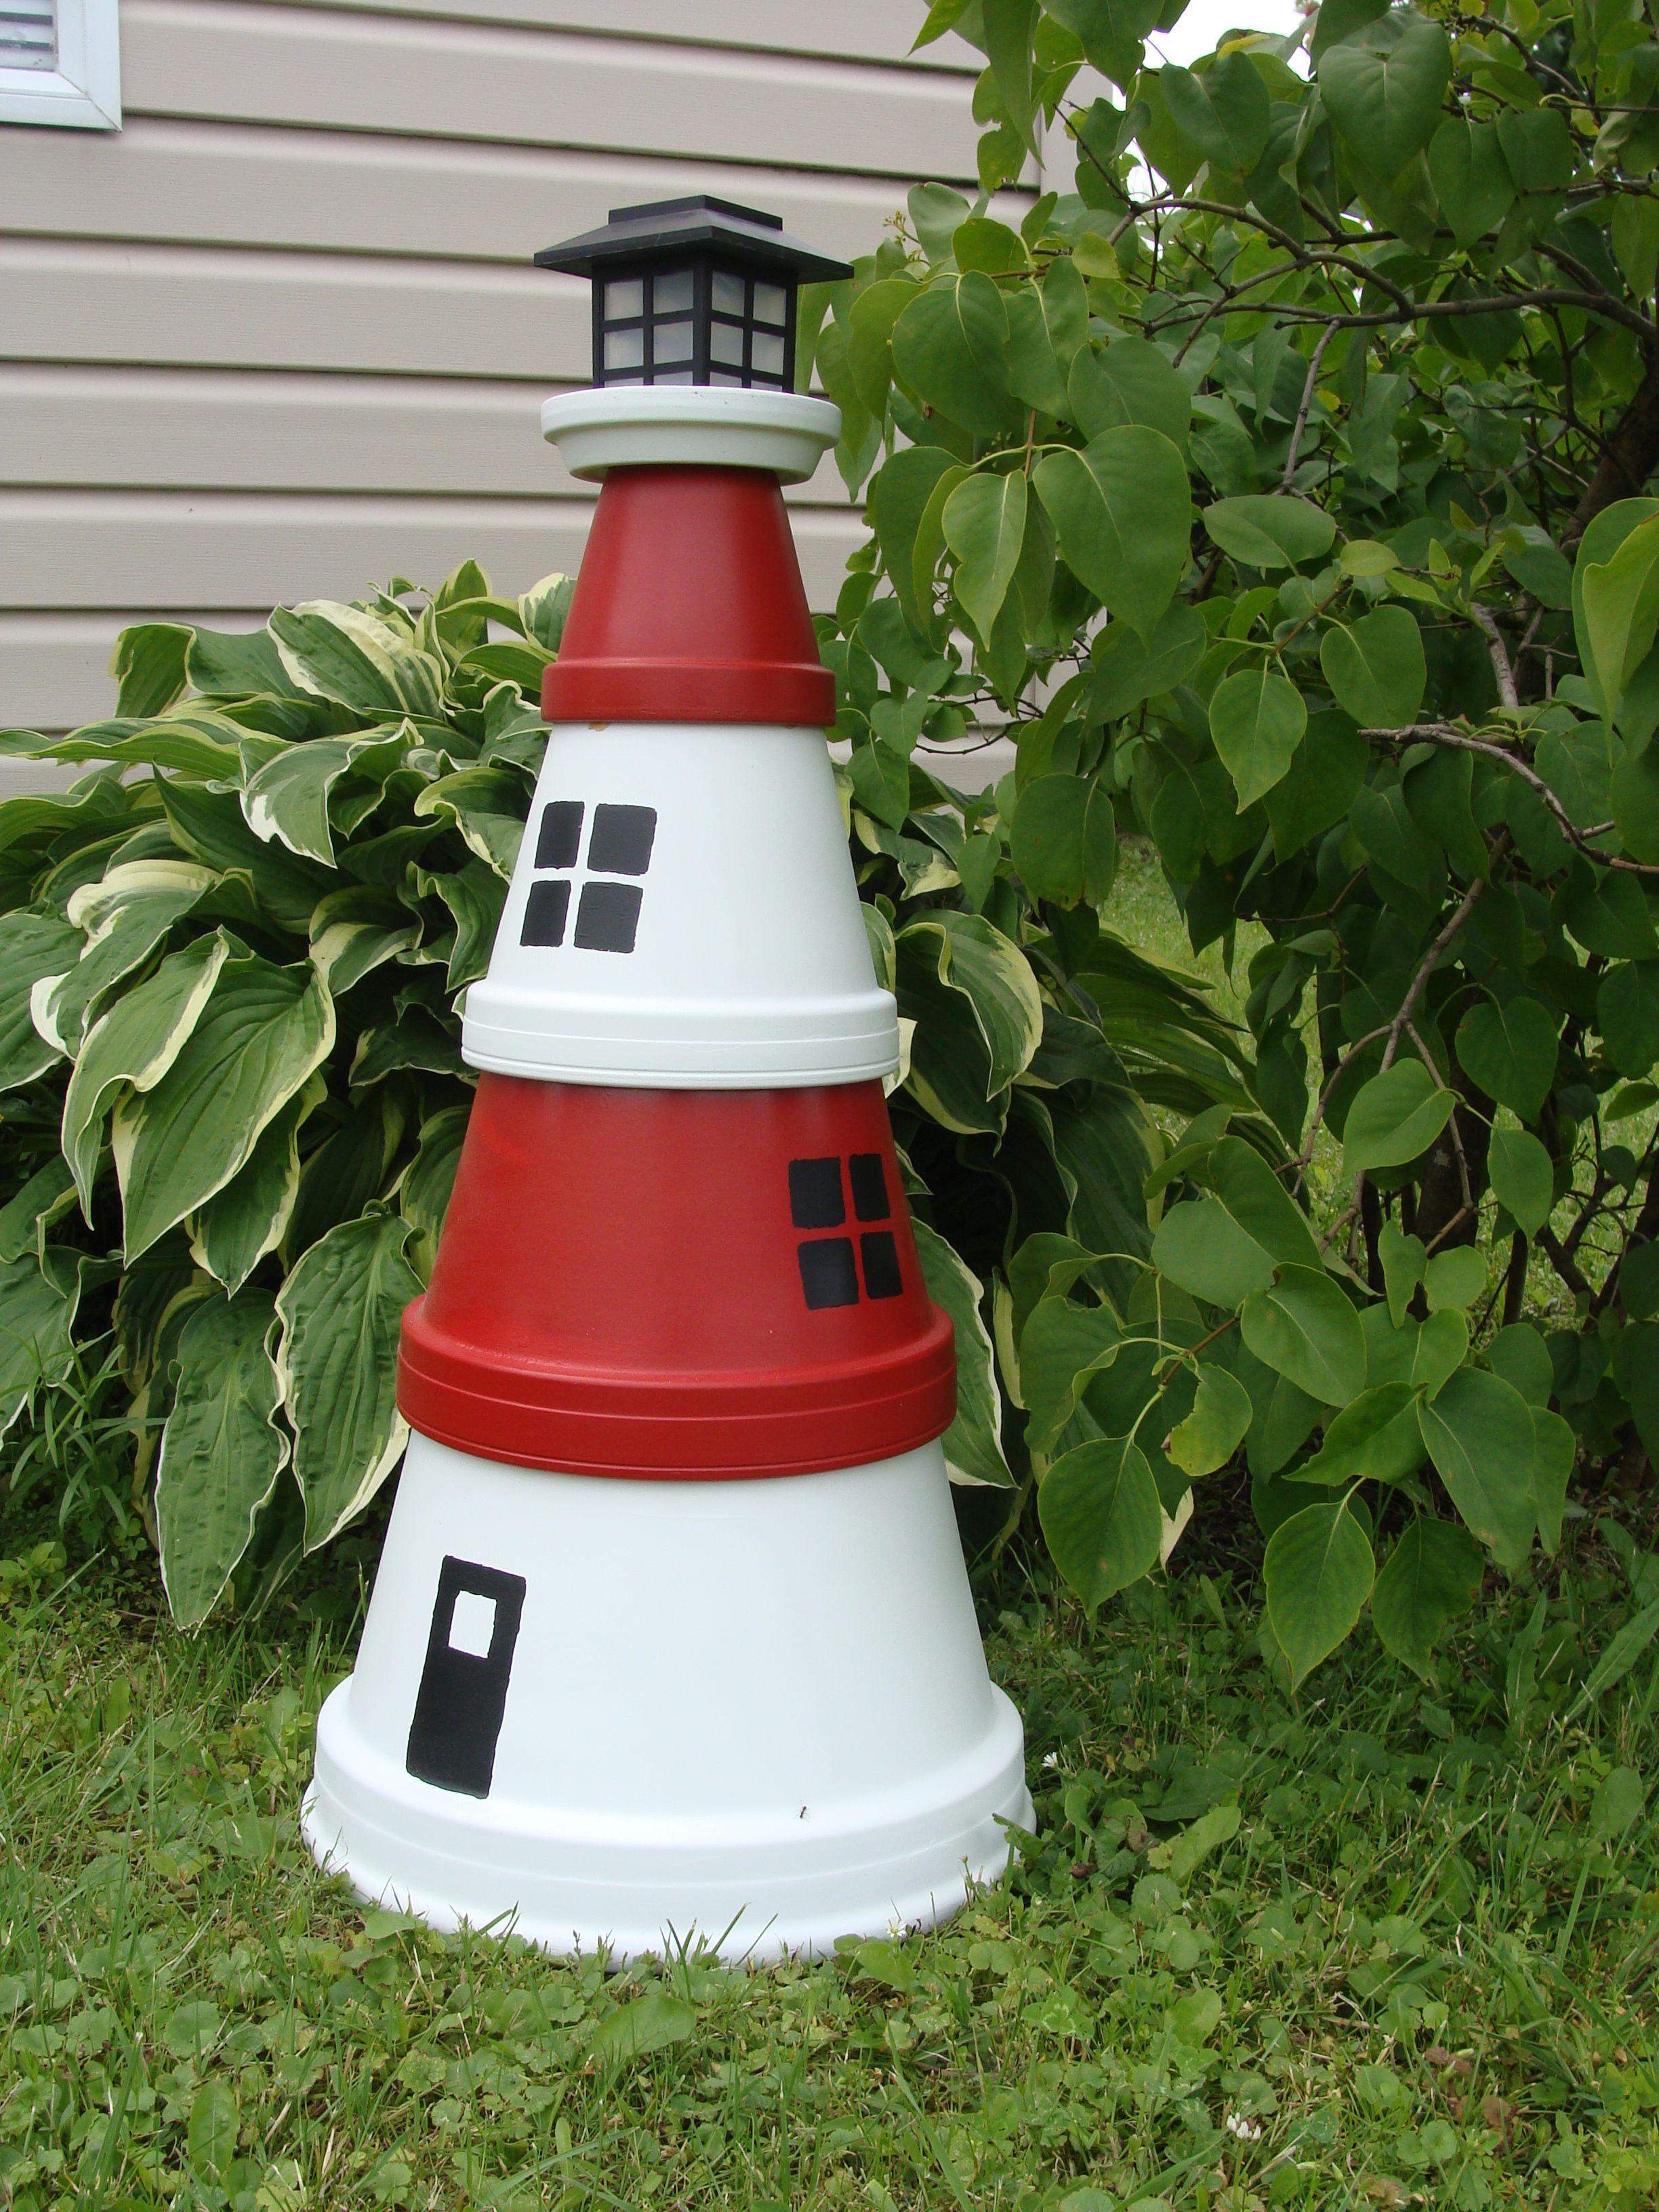 Diy make a clay pot lighthouse diy craft projects - Terracotta Lighthouse